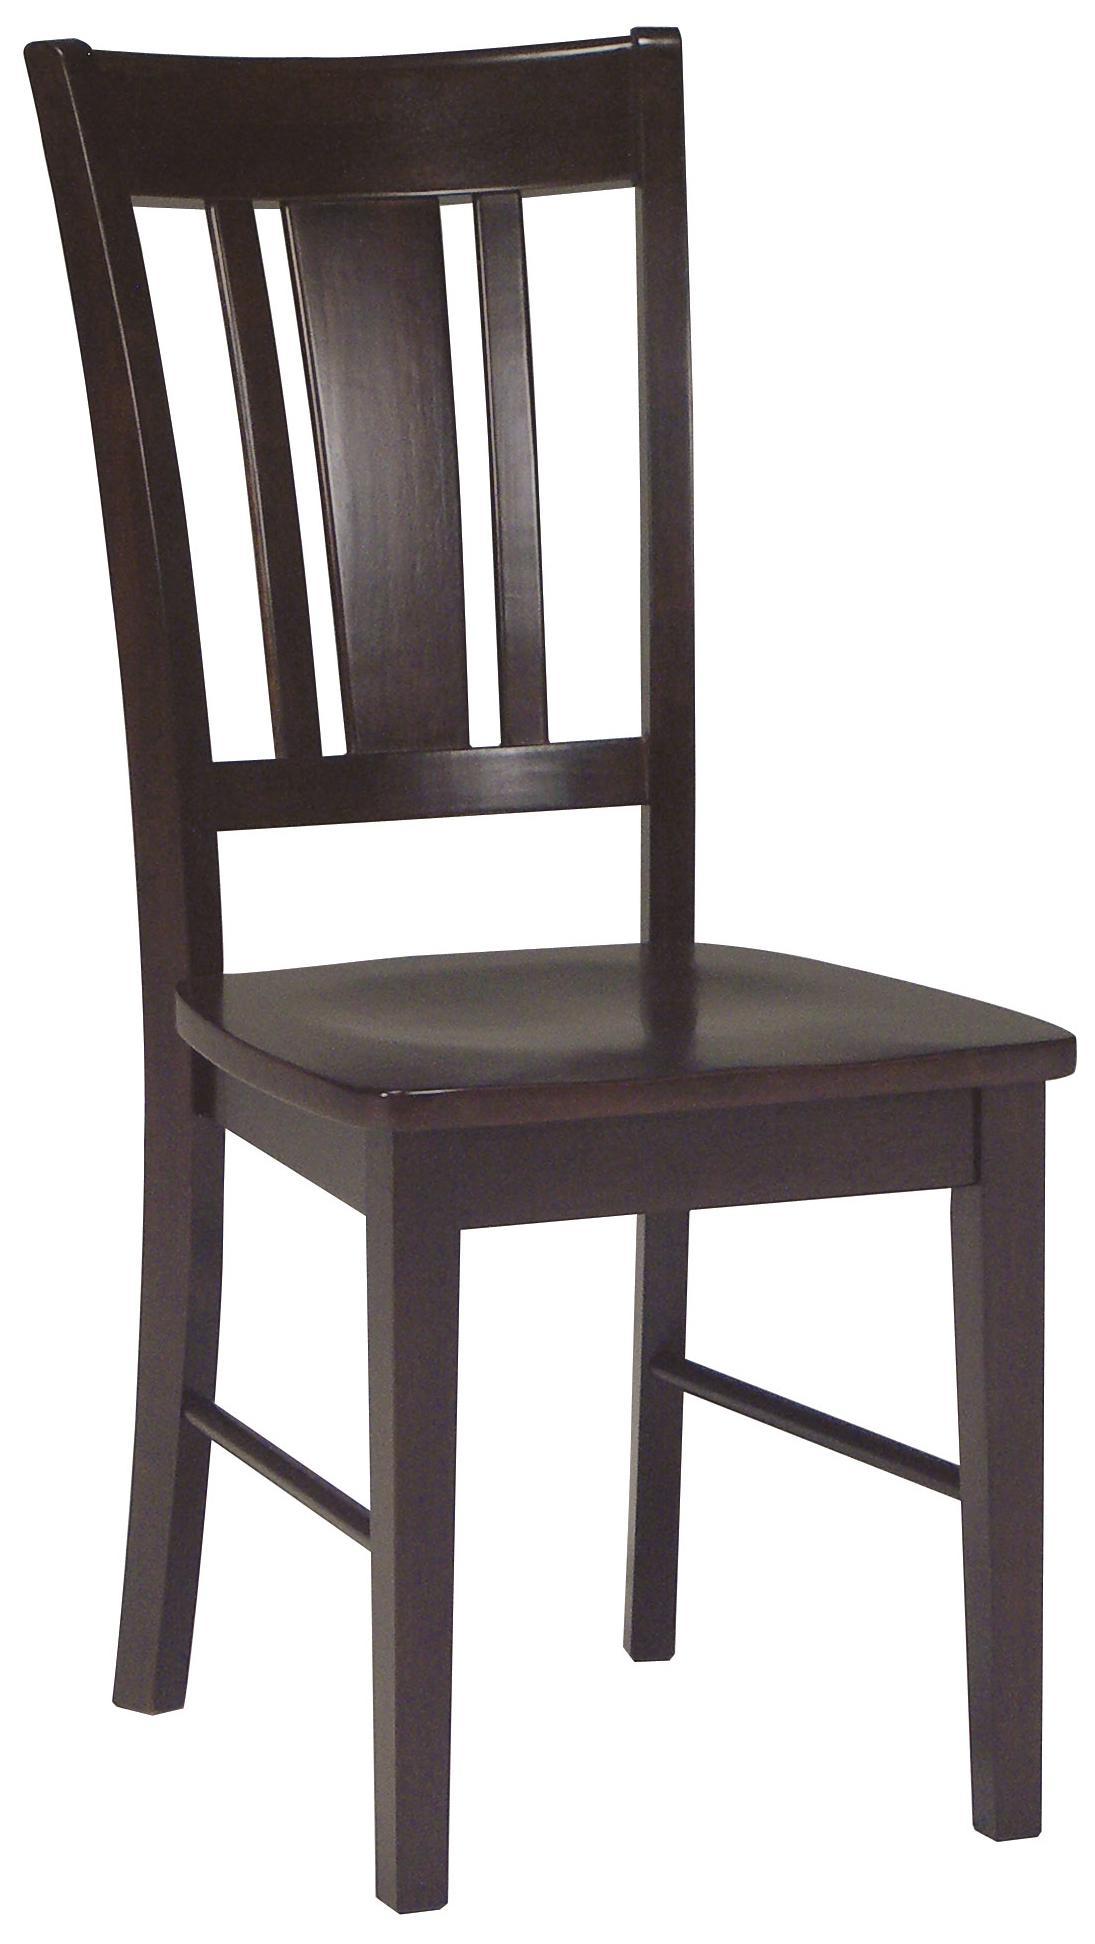 John Thomas Dining Essentials Splat Back Side Chair - Item Number: C15-10